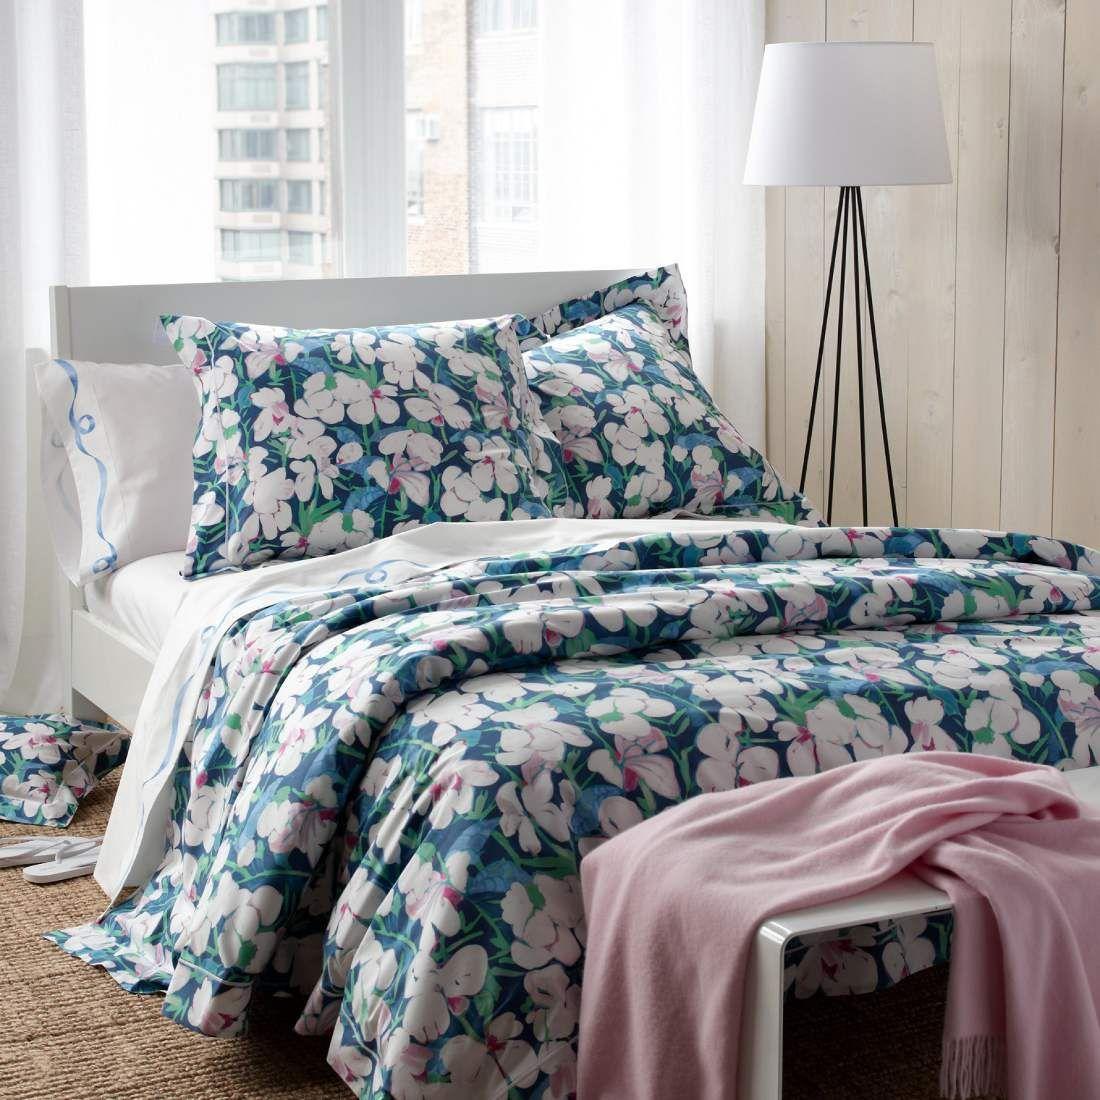 Blue Floral Duvet Covers & Bedding Matouk Lulu DK Viola